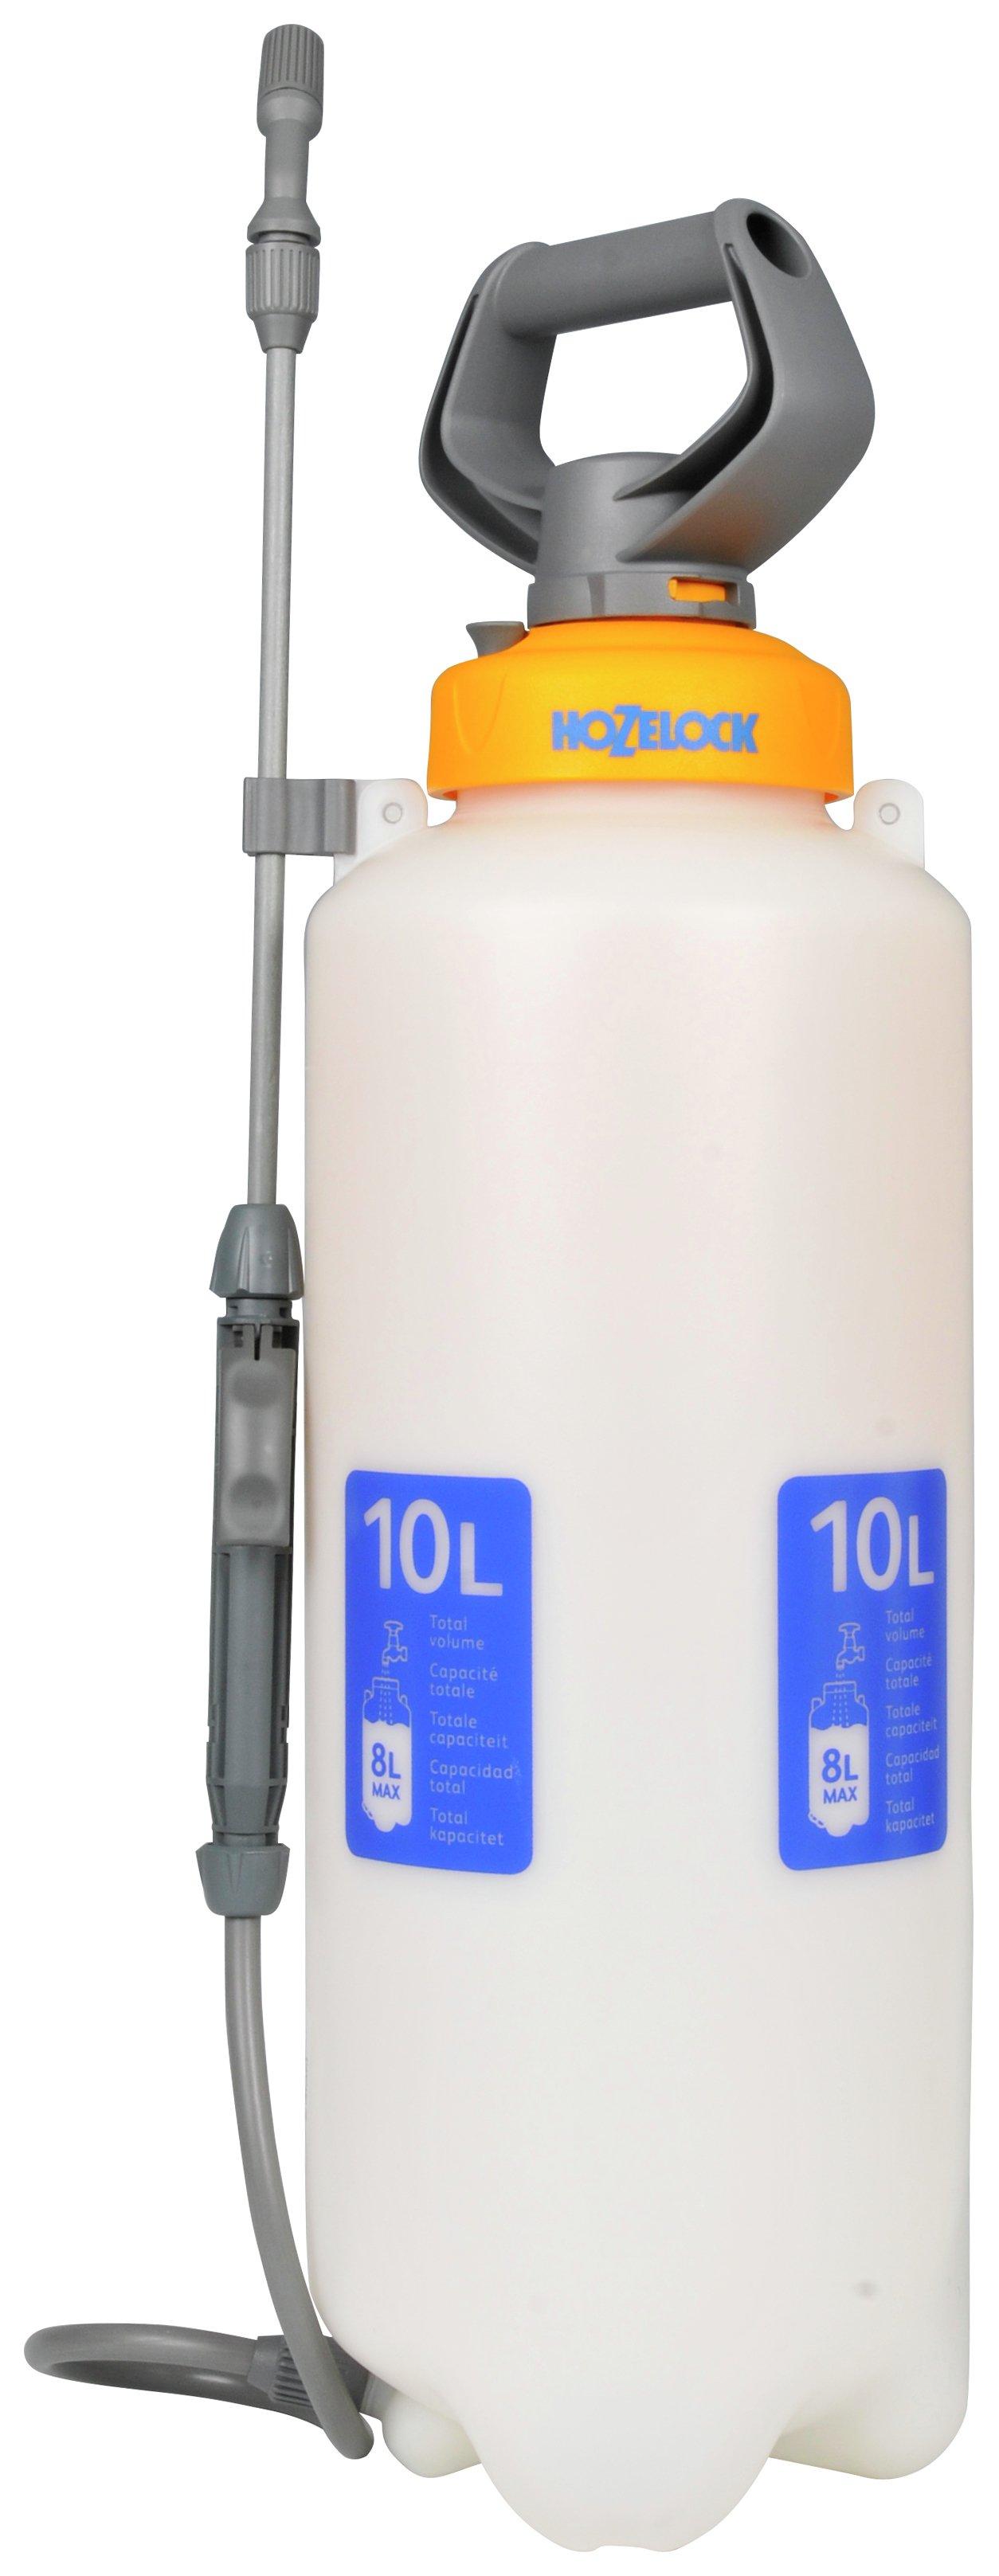 Image of Hozelock 10L Pressure Sprayer.